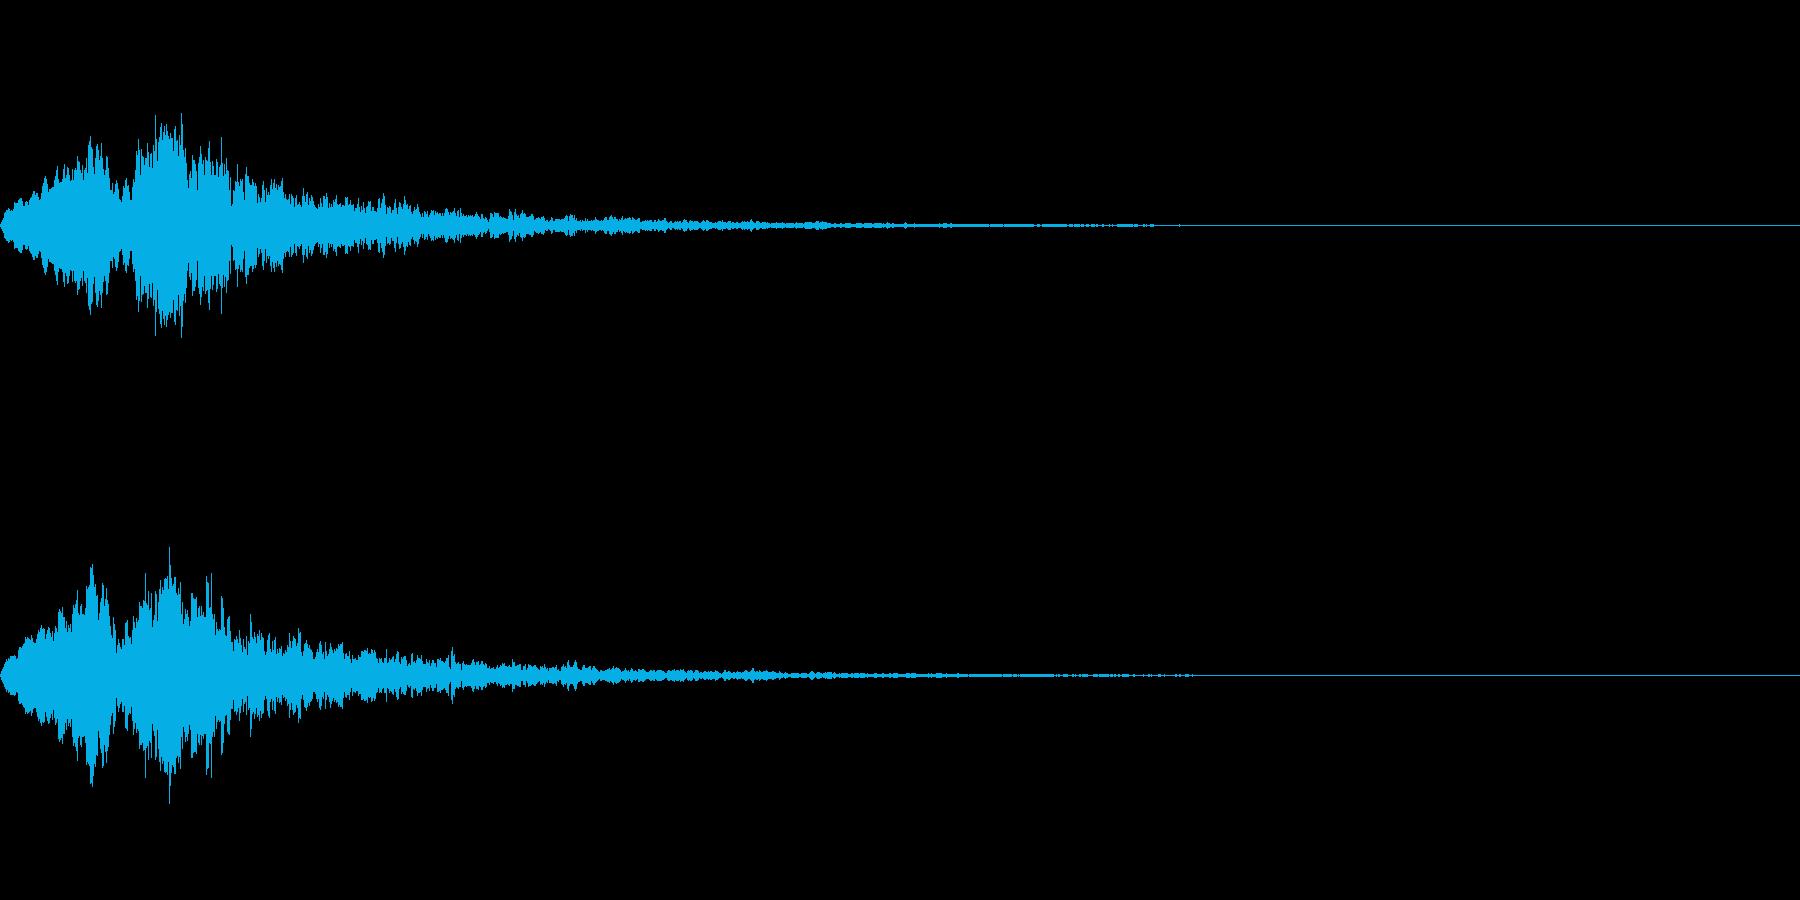 Vox 不気味な鳴き声 ホラーSE 2の再生済みの波形